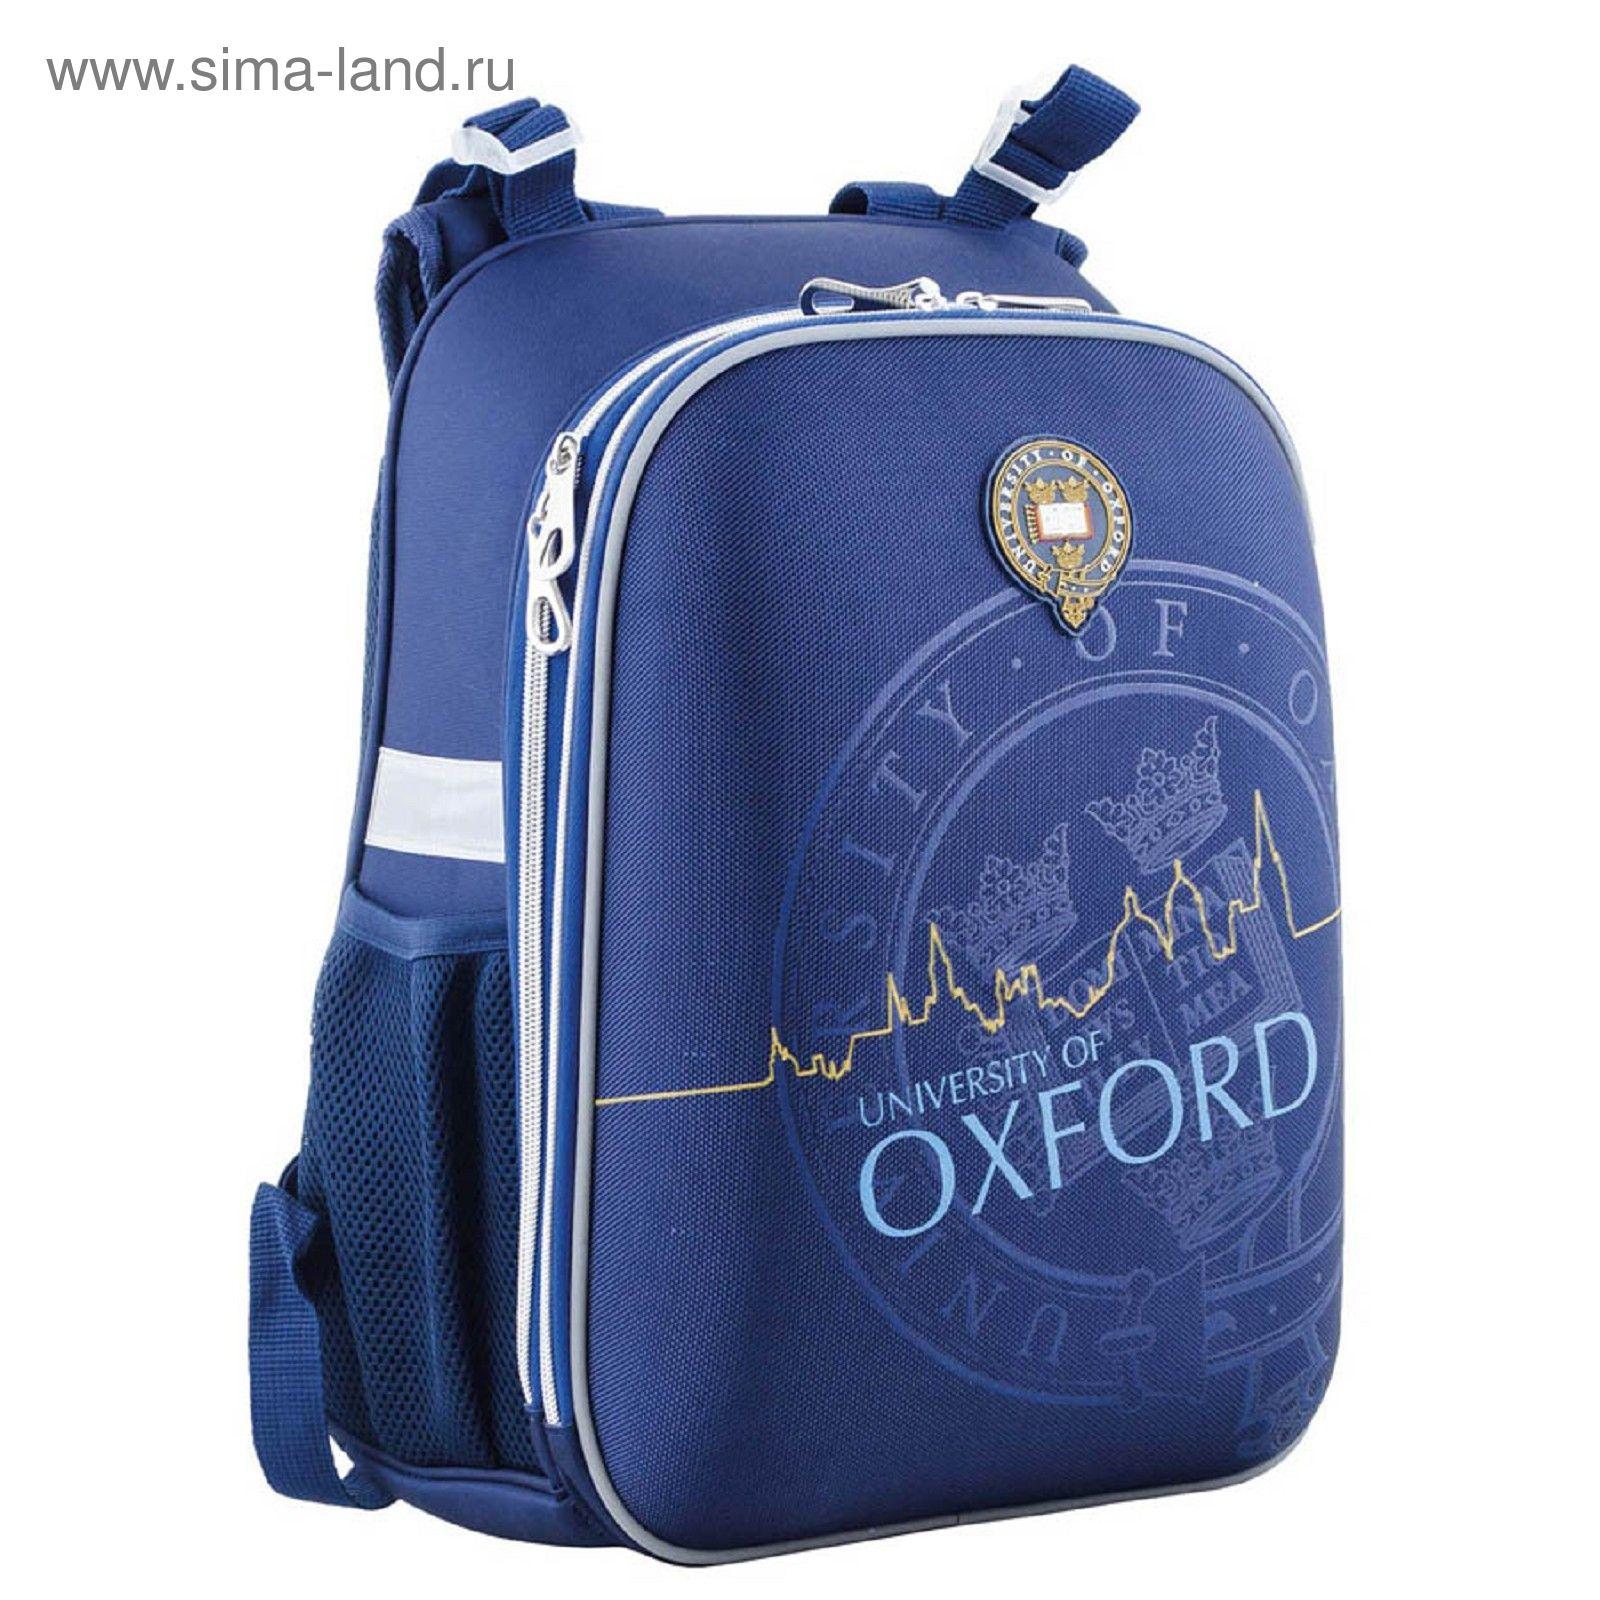 eb15d831a2e2 Рюкзак каркасный YES H-12 38*29*15 для мальчика Oxford, синий 553369 ...